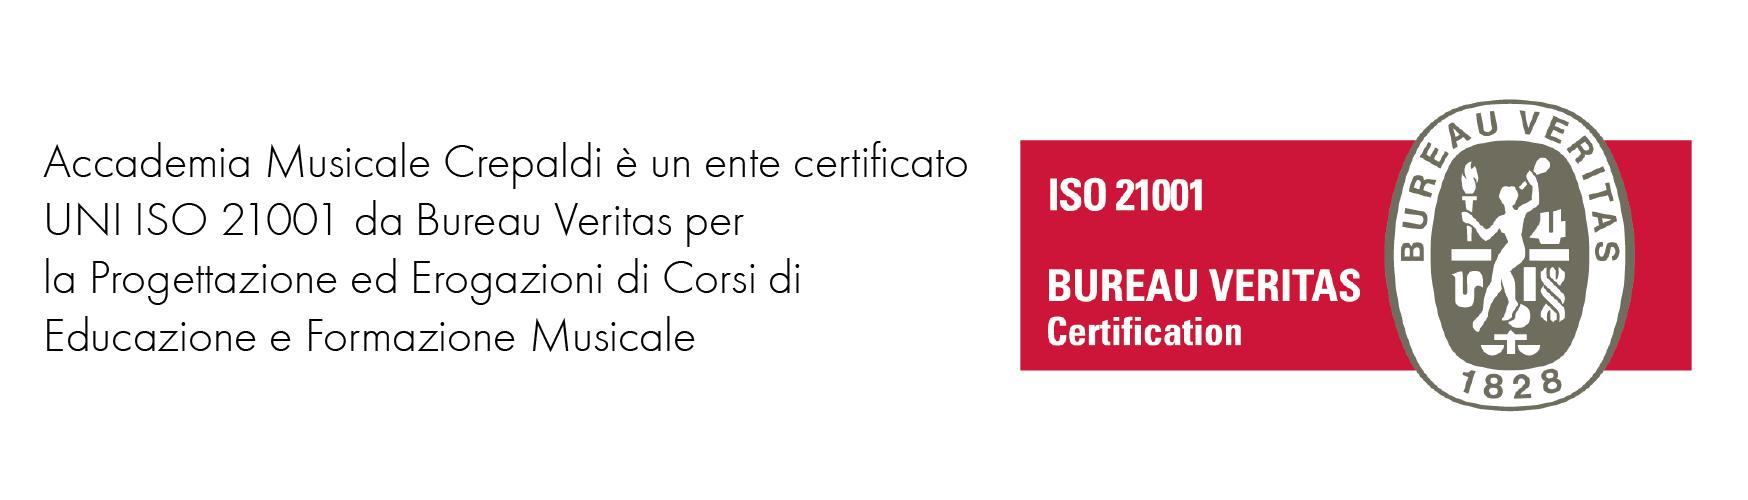 Accademia Musicale Crepaldi è certificata UNI ISO da Bureau Veritas